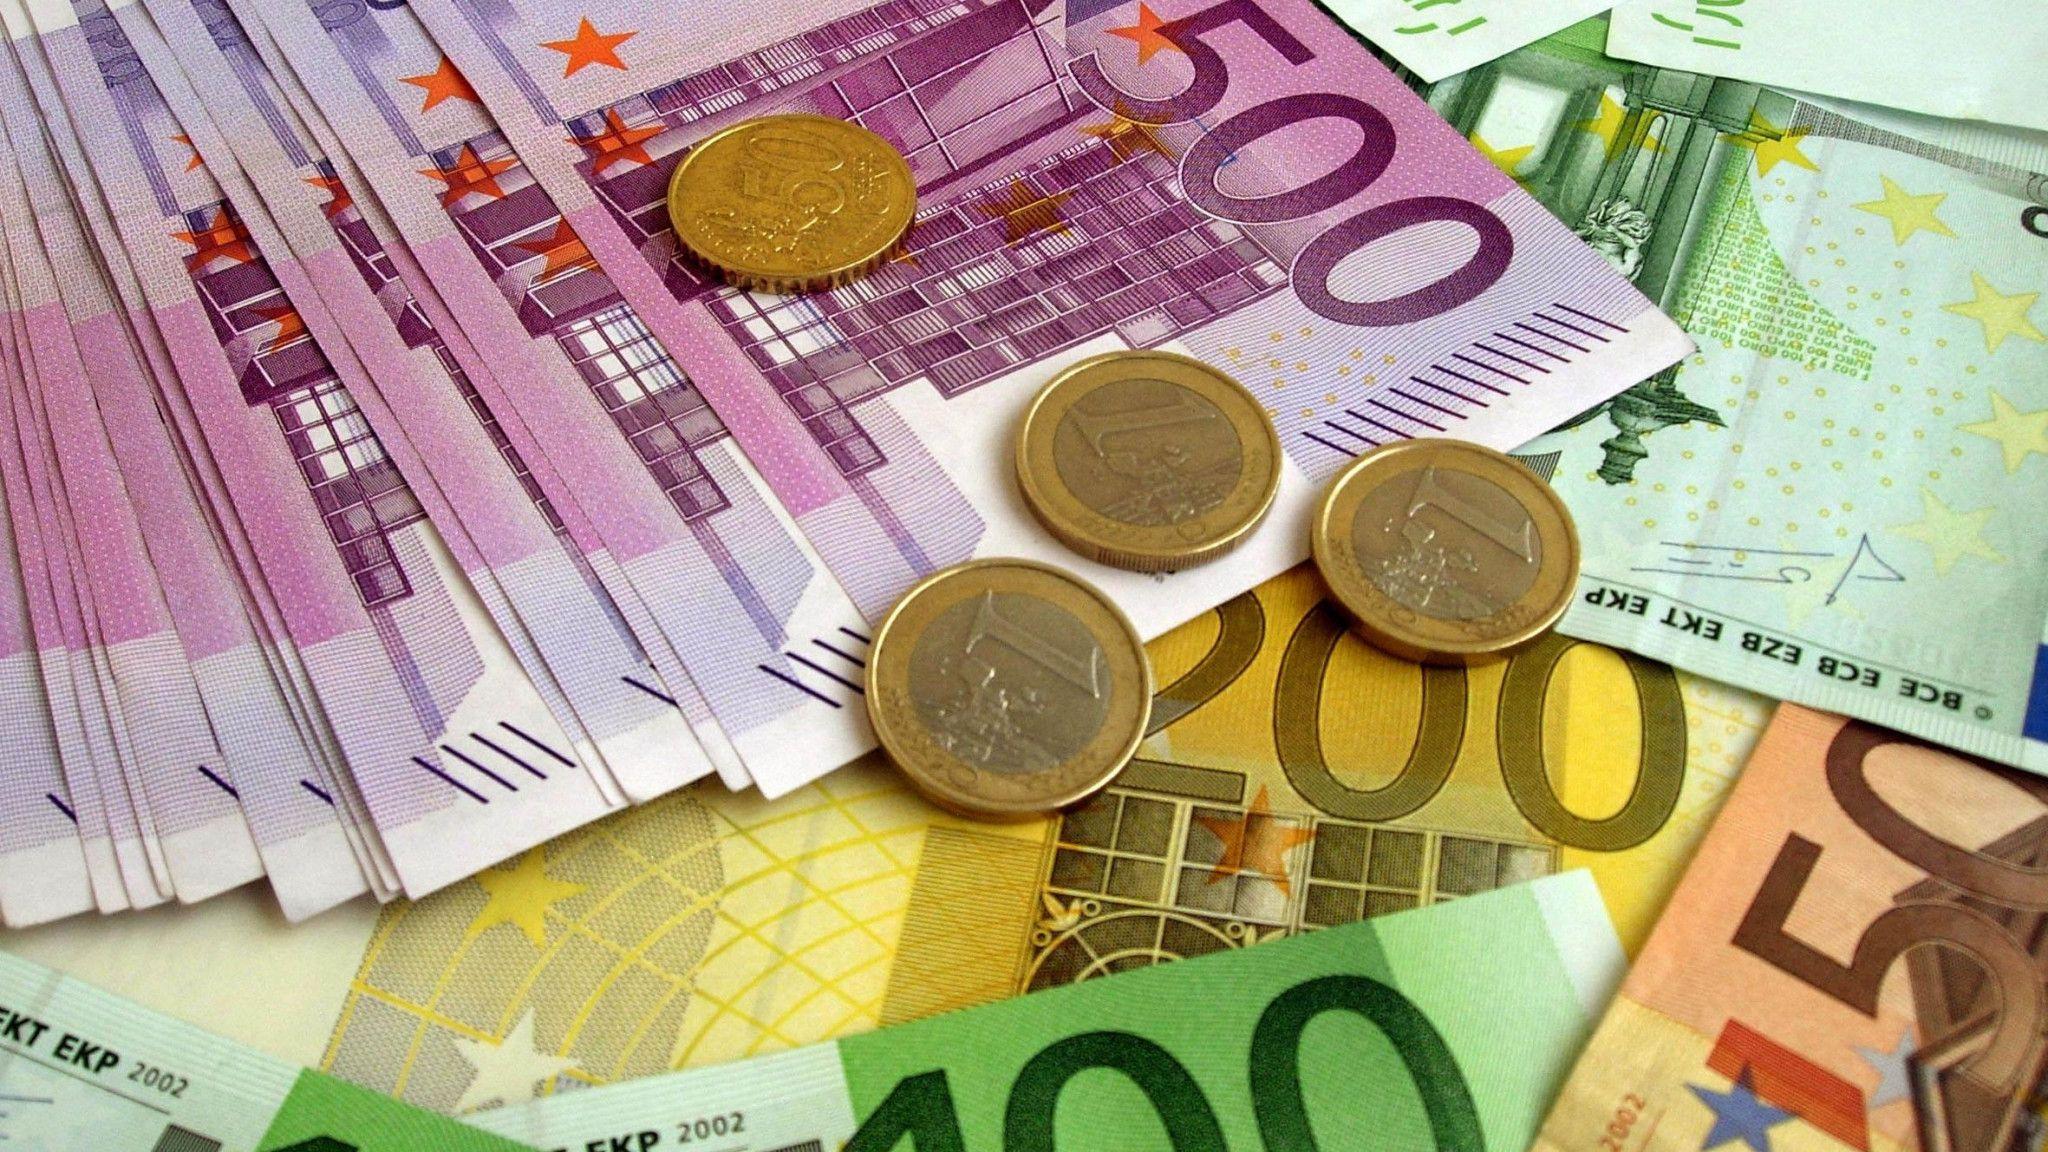 Curs valutar BNR 29 iulie 2020. Ce valoare a atins azi euro